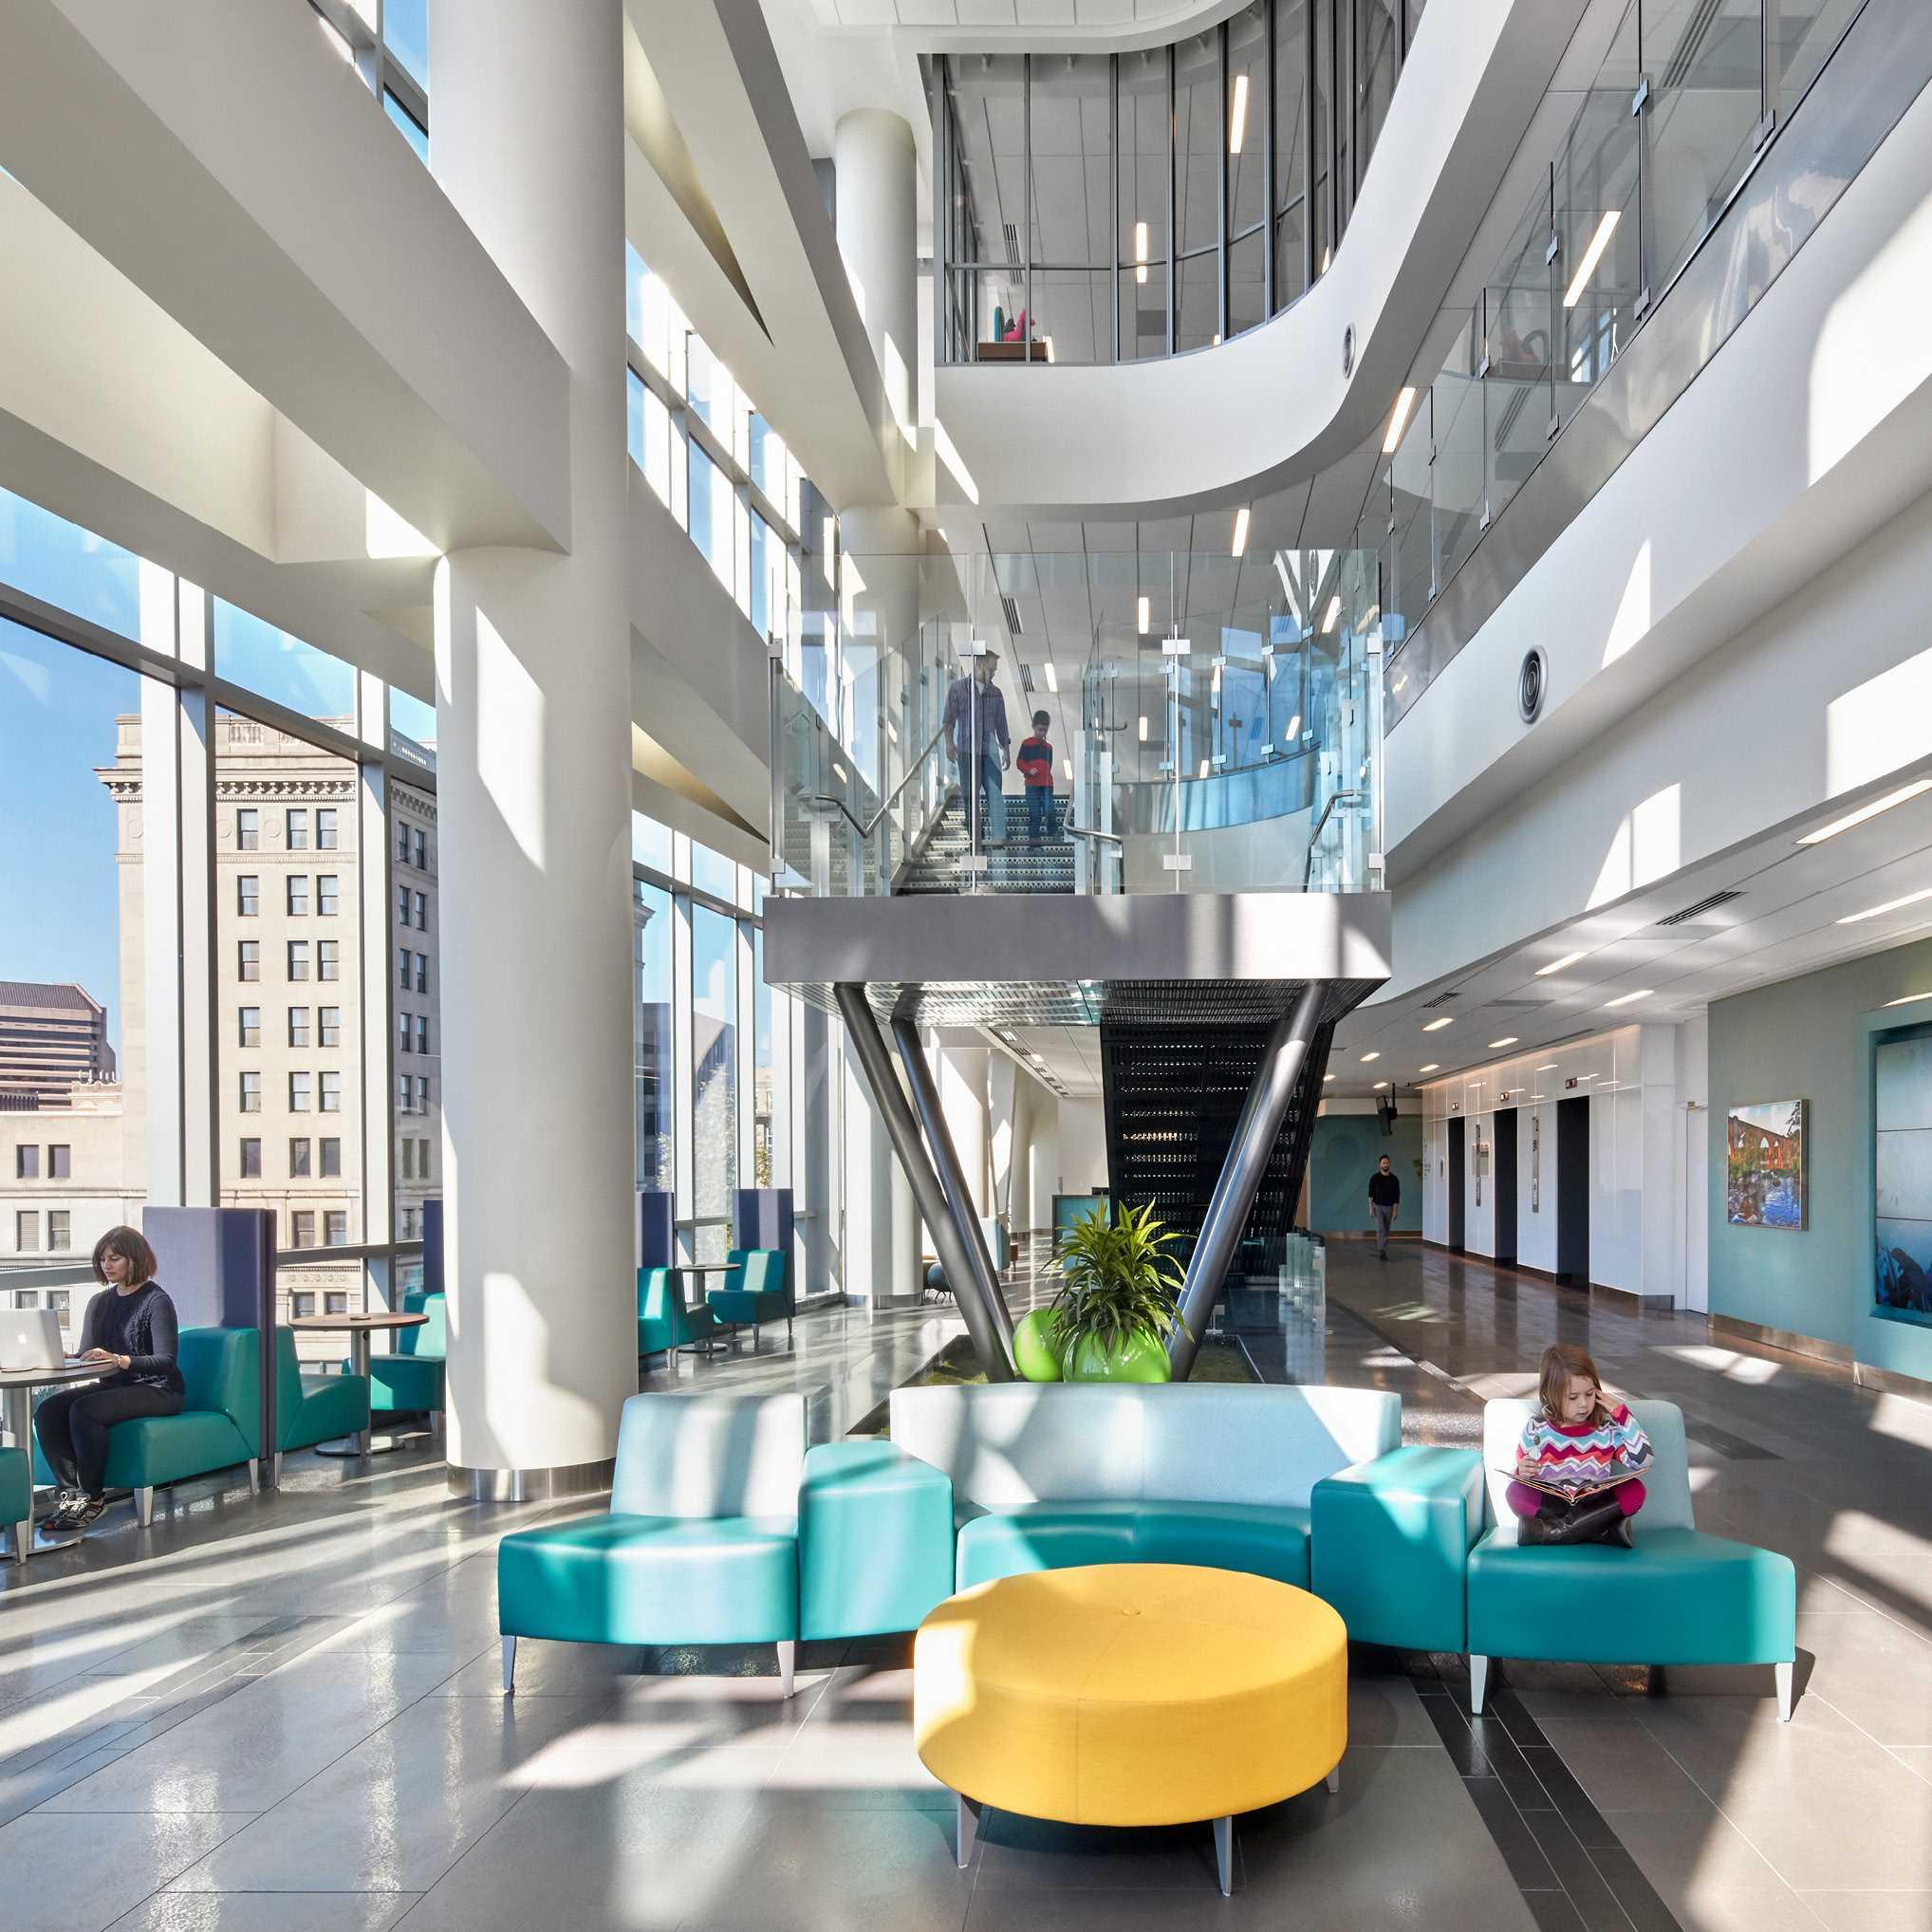 Health New York: HKS Architects